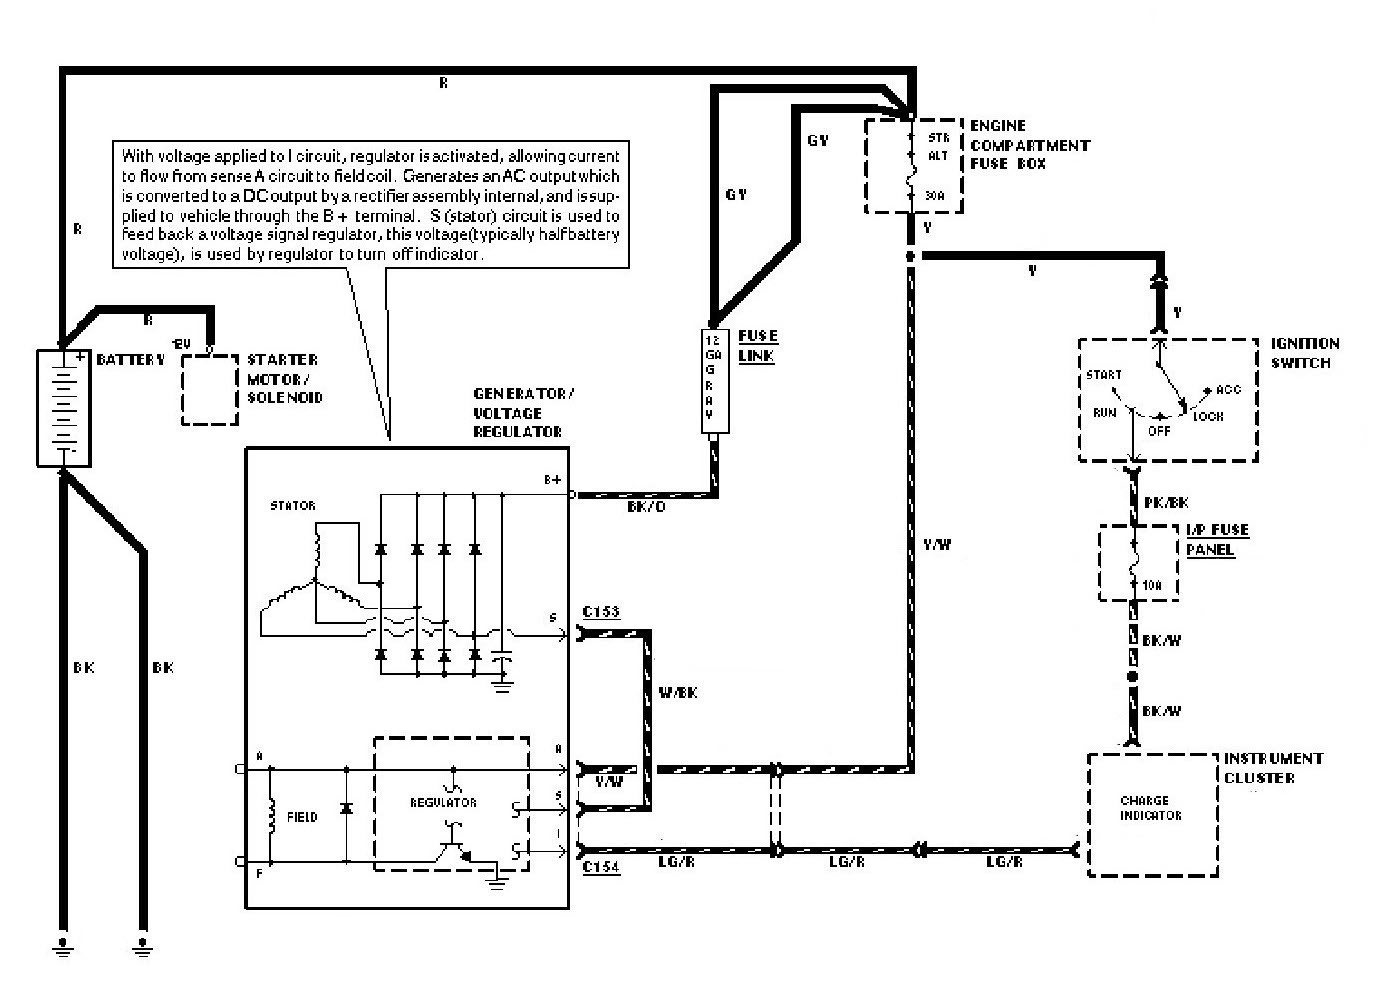 Internal Alternator Regulator Wiring Diagram   Wiring Library - Ford Alternator Wiring Diagram Internal Regulator